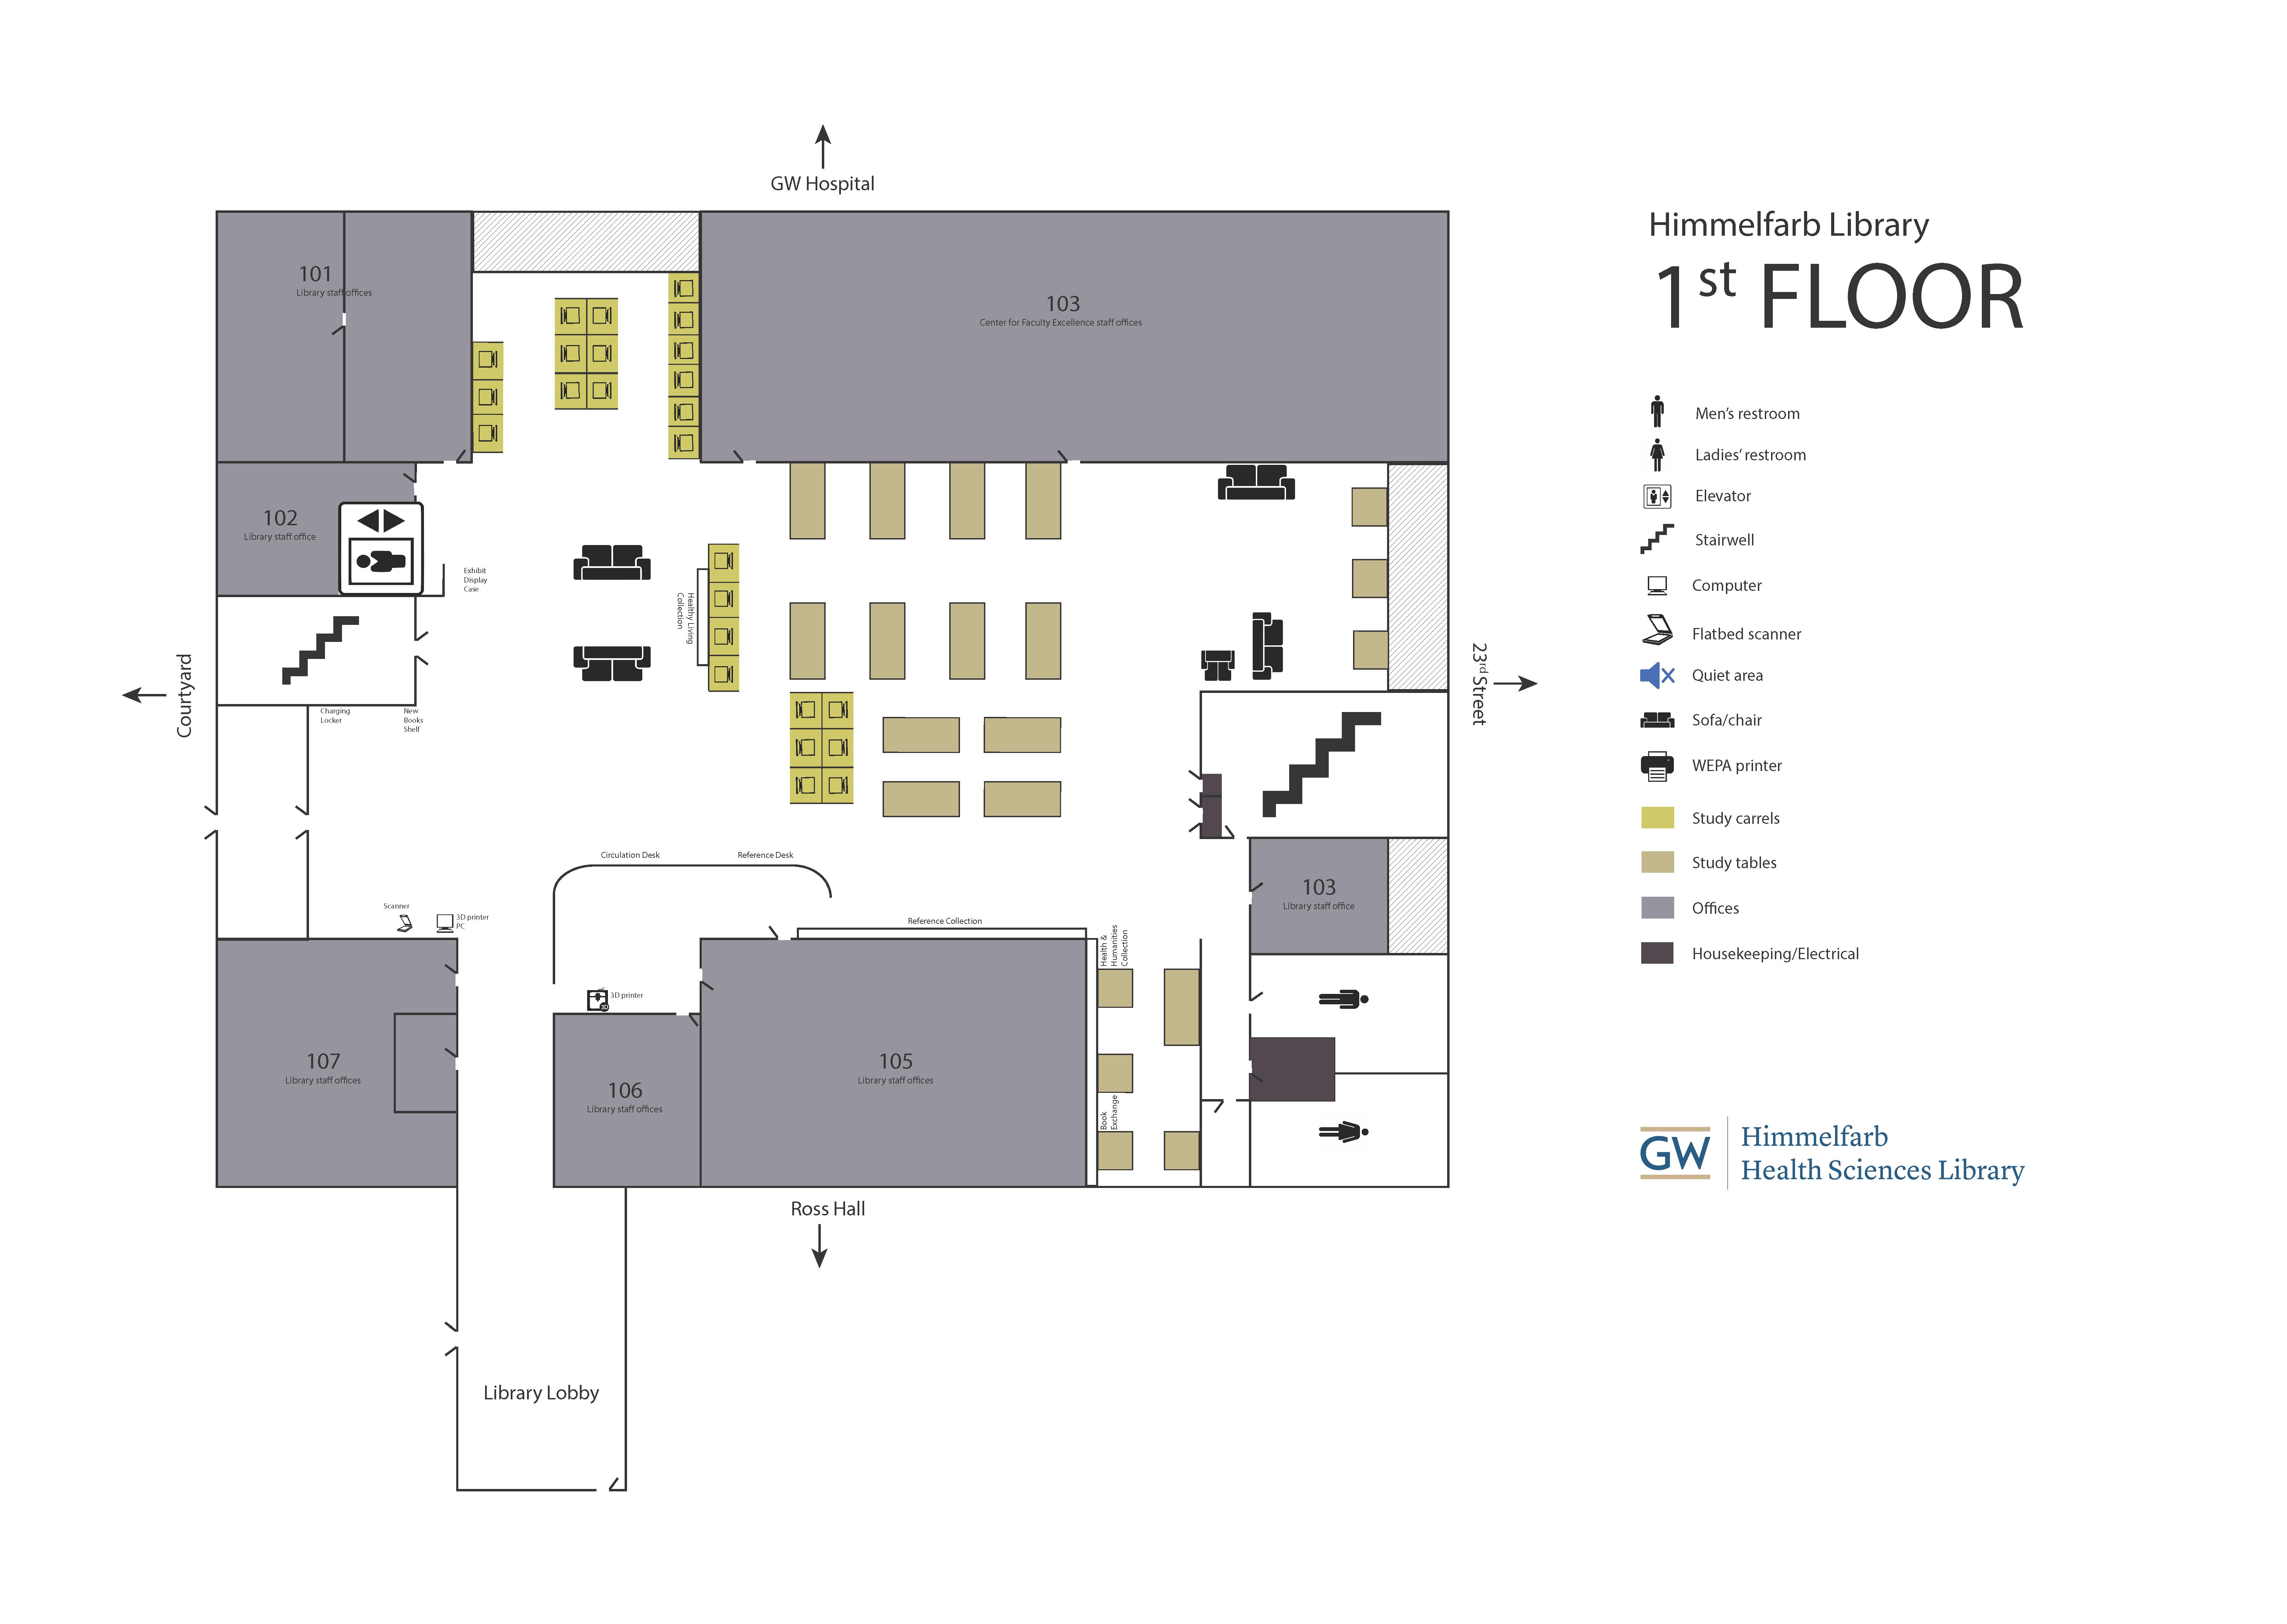 Himmelfarb Library 1st Floor